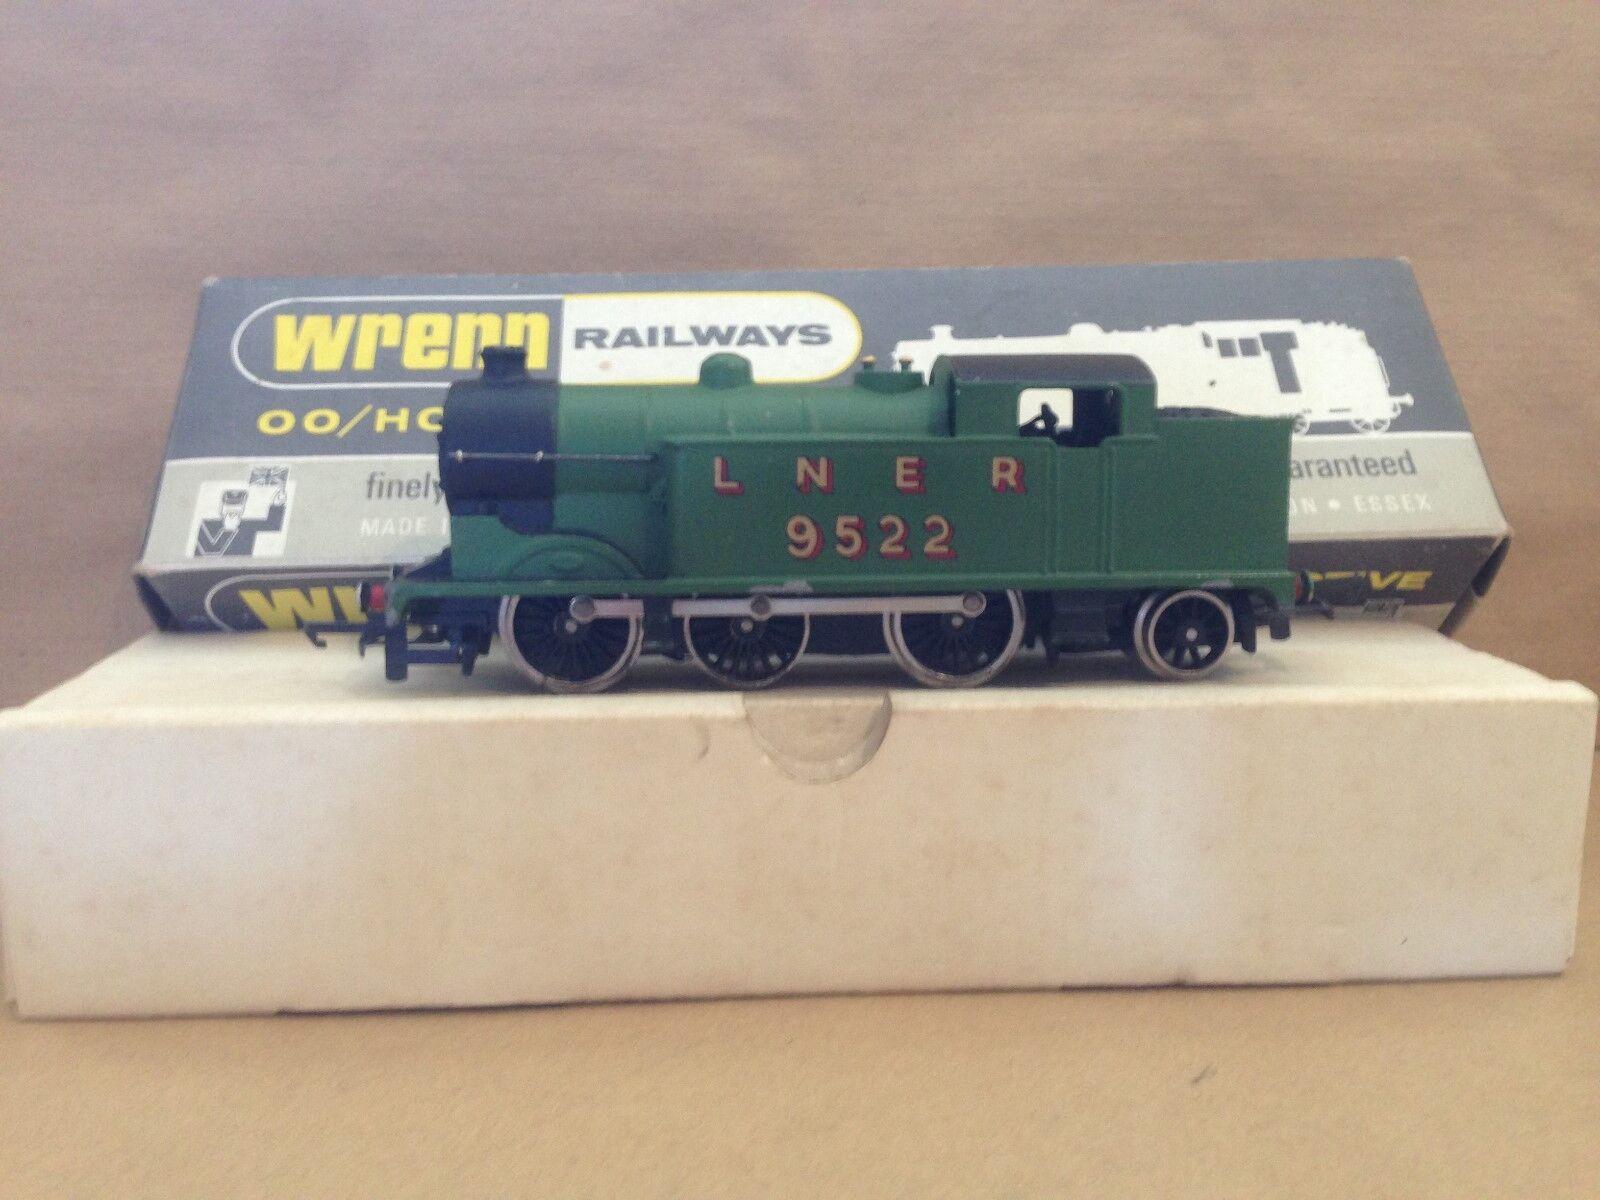 Wrenn W2217 0-6-2 LNER Tank locomotive, boxed